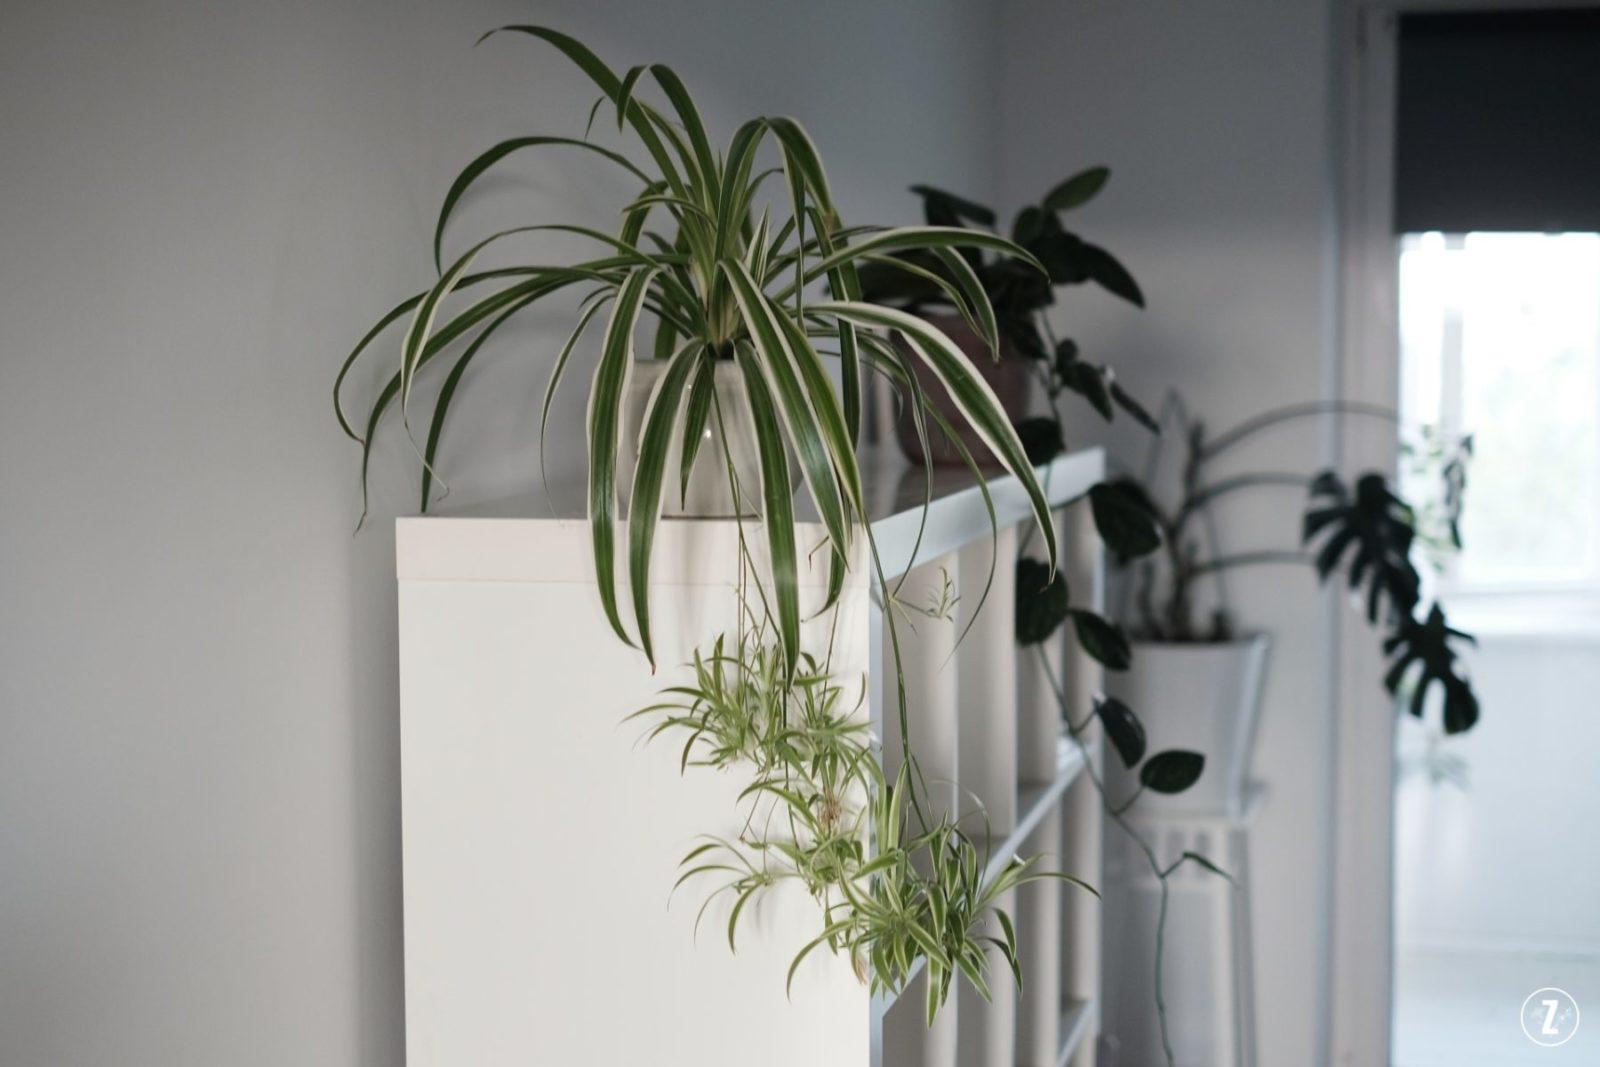 chlorophytum, comosum, roslina do biura, roslina do sypialni, roslina tropikalna, spider plant, zielistka, zielistka sternberga, zielony lisc